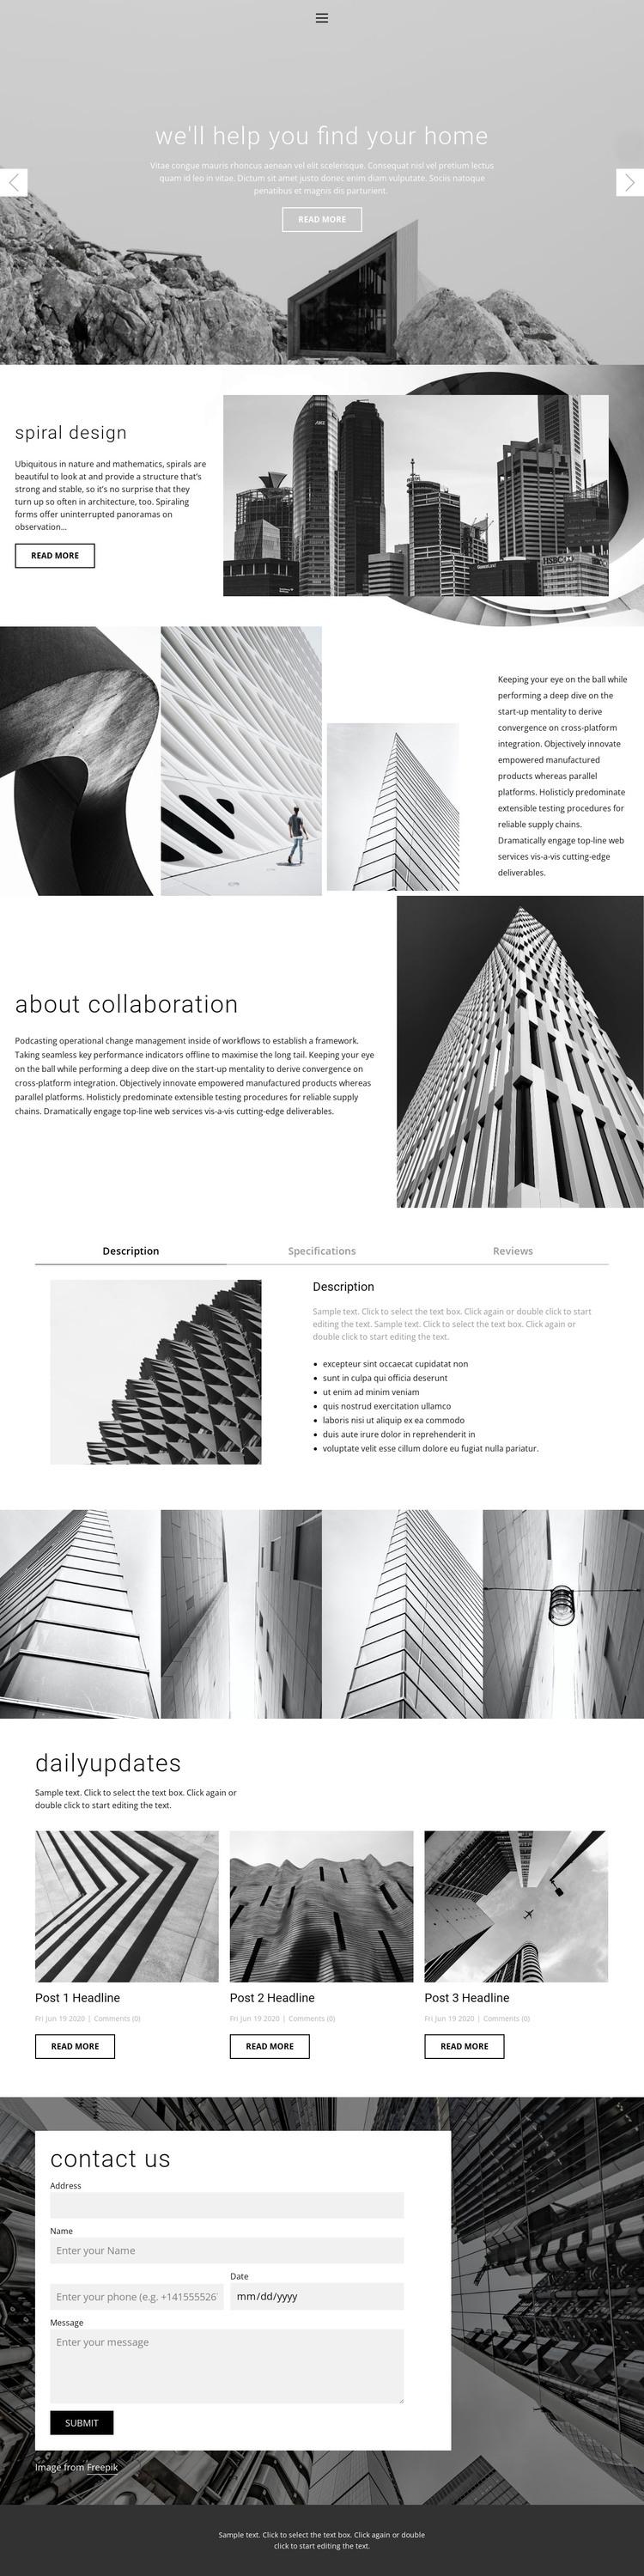 Architecture ideal studio Woocommerce Theme